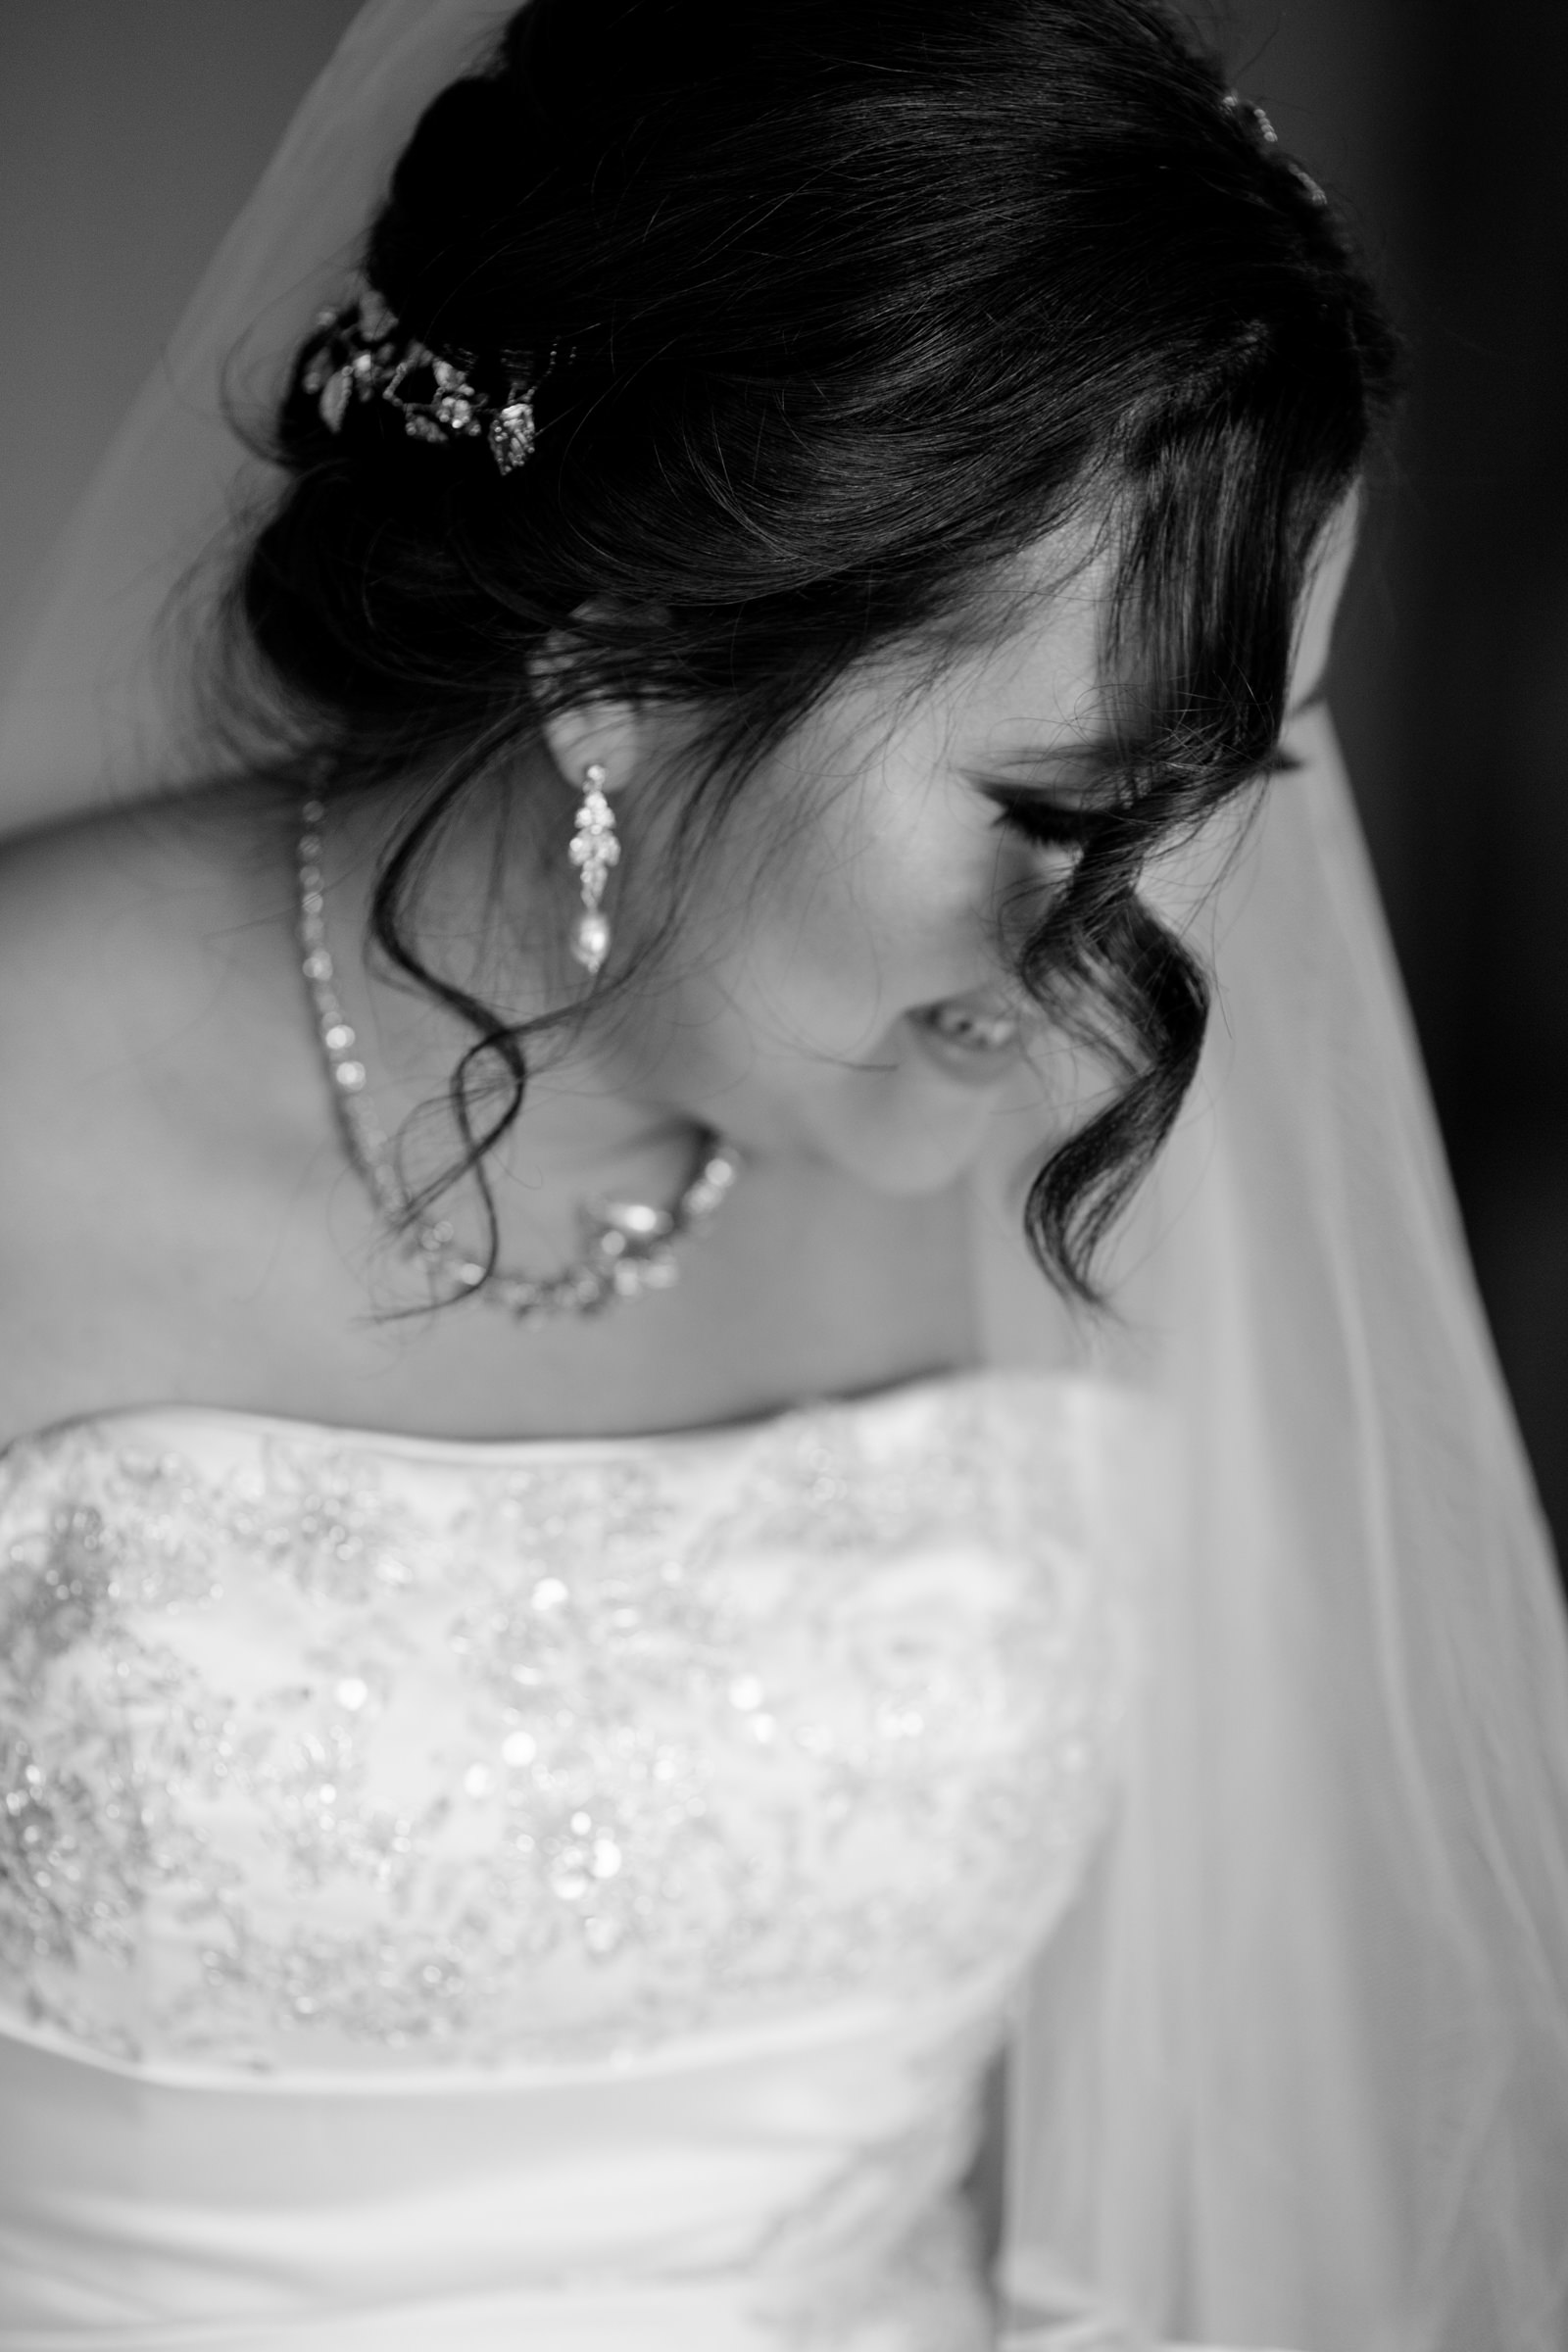 wedding-photographer-photography-destination-hawaii-lake-tahoe-getting-ready-bride-portrait